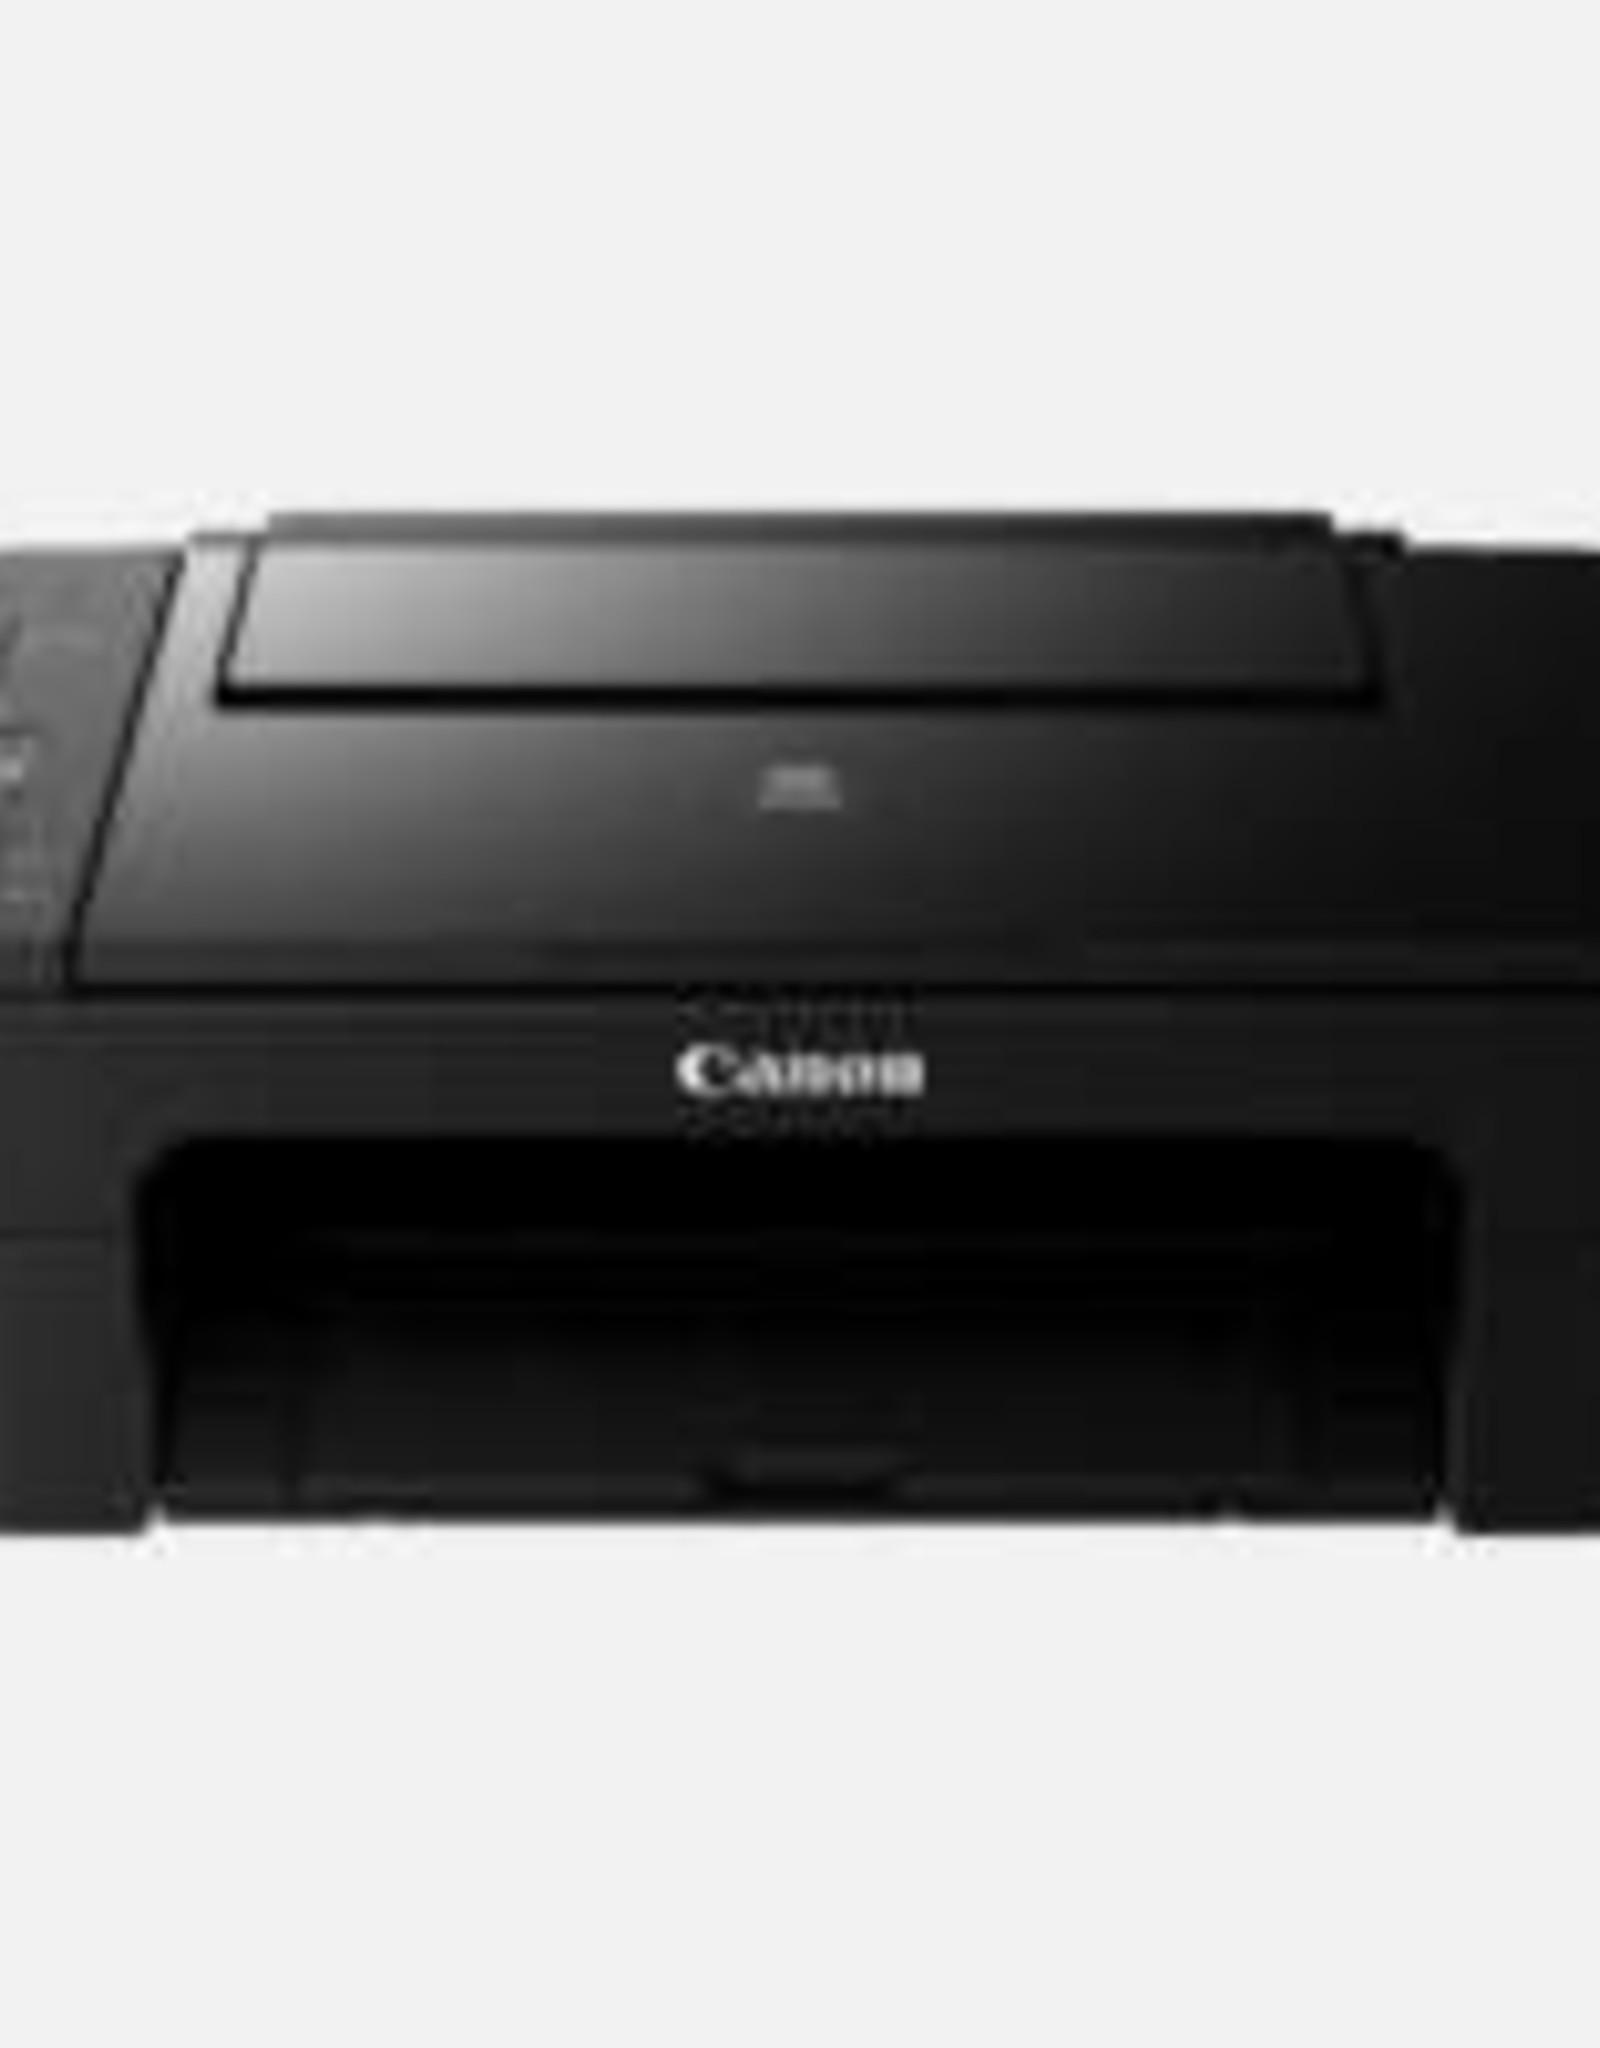 PIXMA TS3350 AIO / Copy / Print / Scan / WiFi / Black (refurbished)